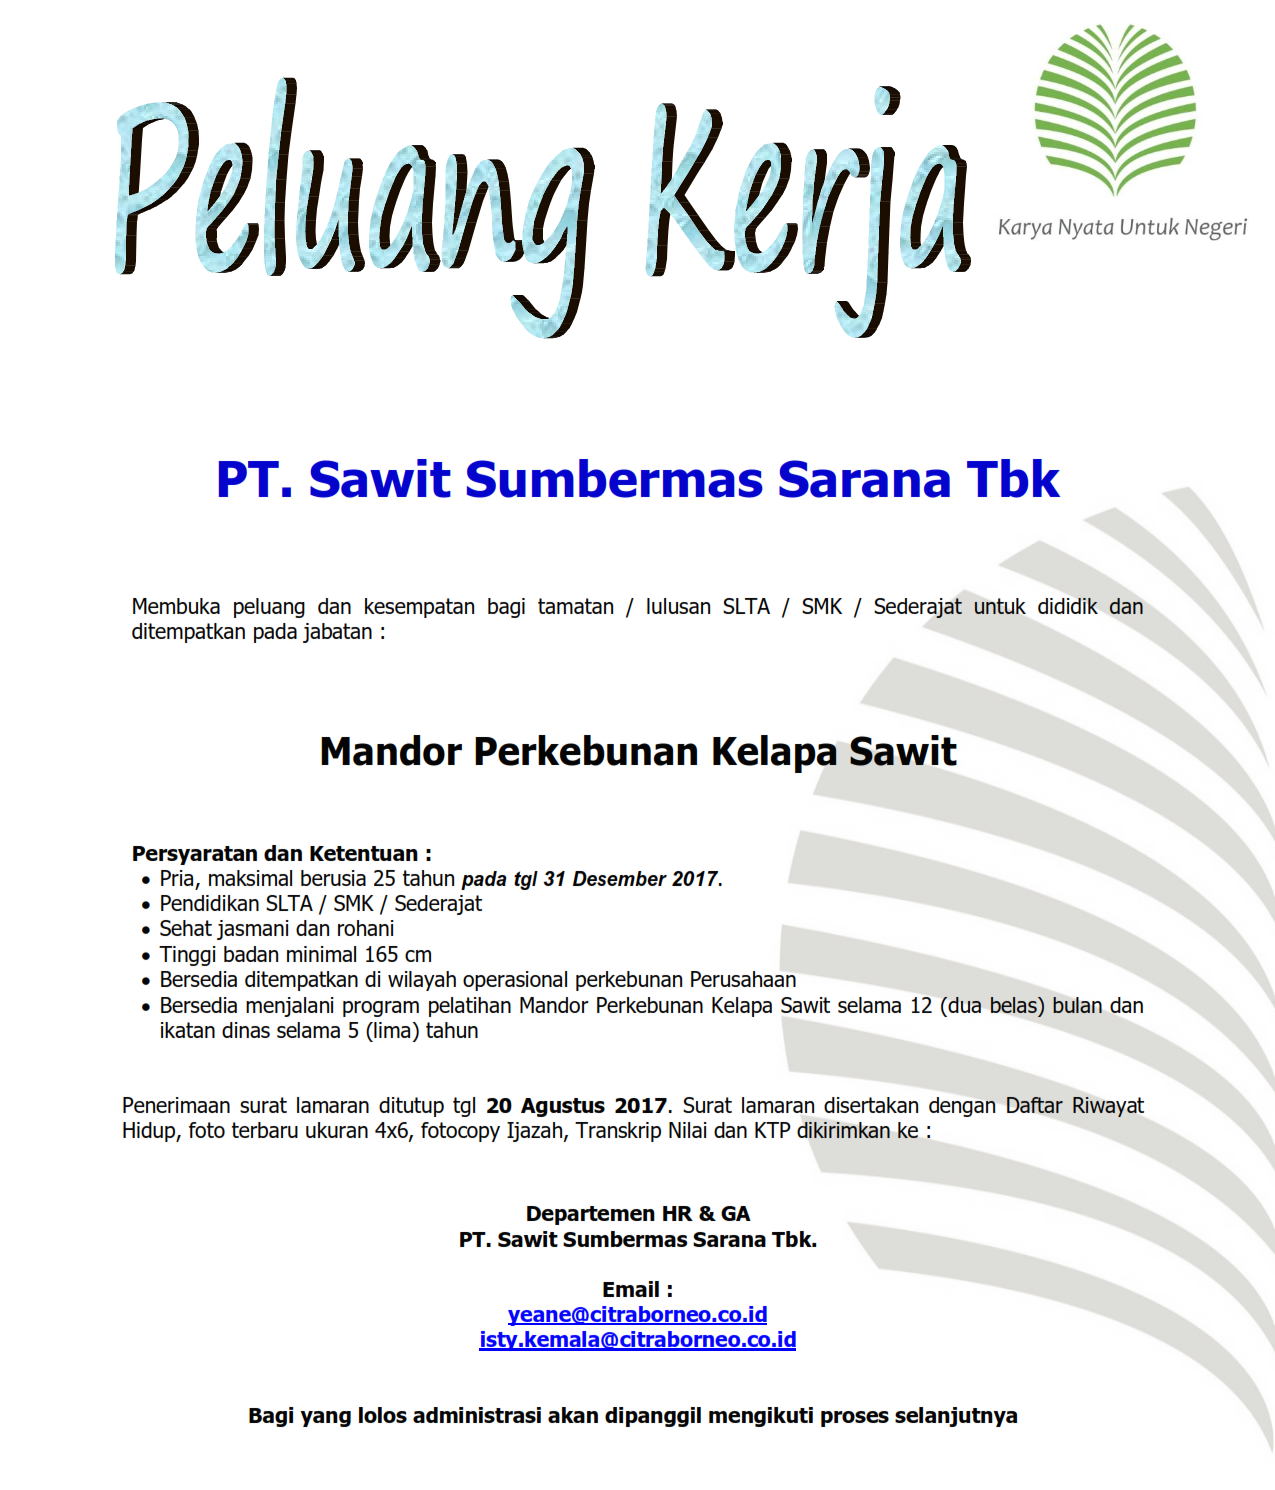 Lowongan Kerja PT. Sawit Sumbermas Sarana Tbk, CBI Group